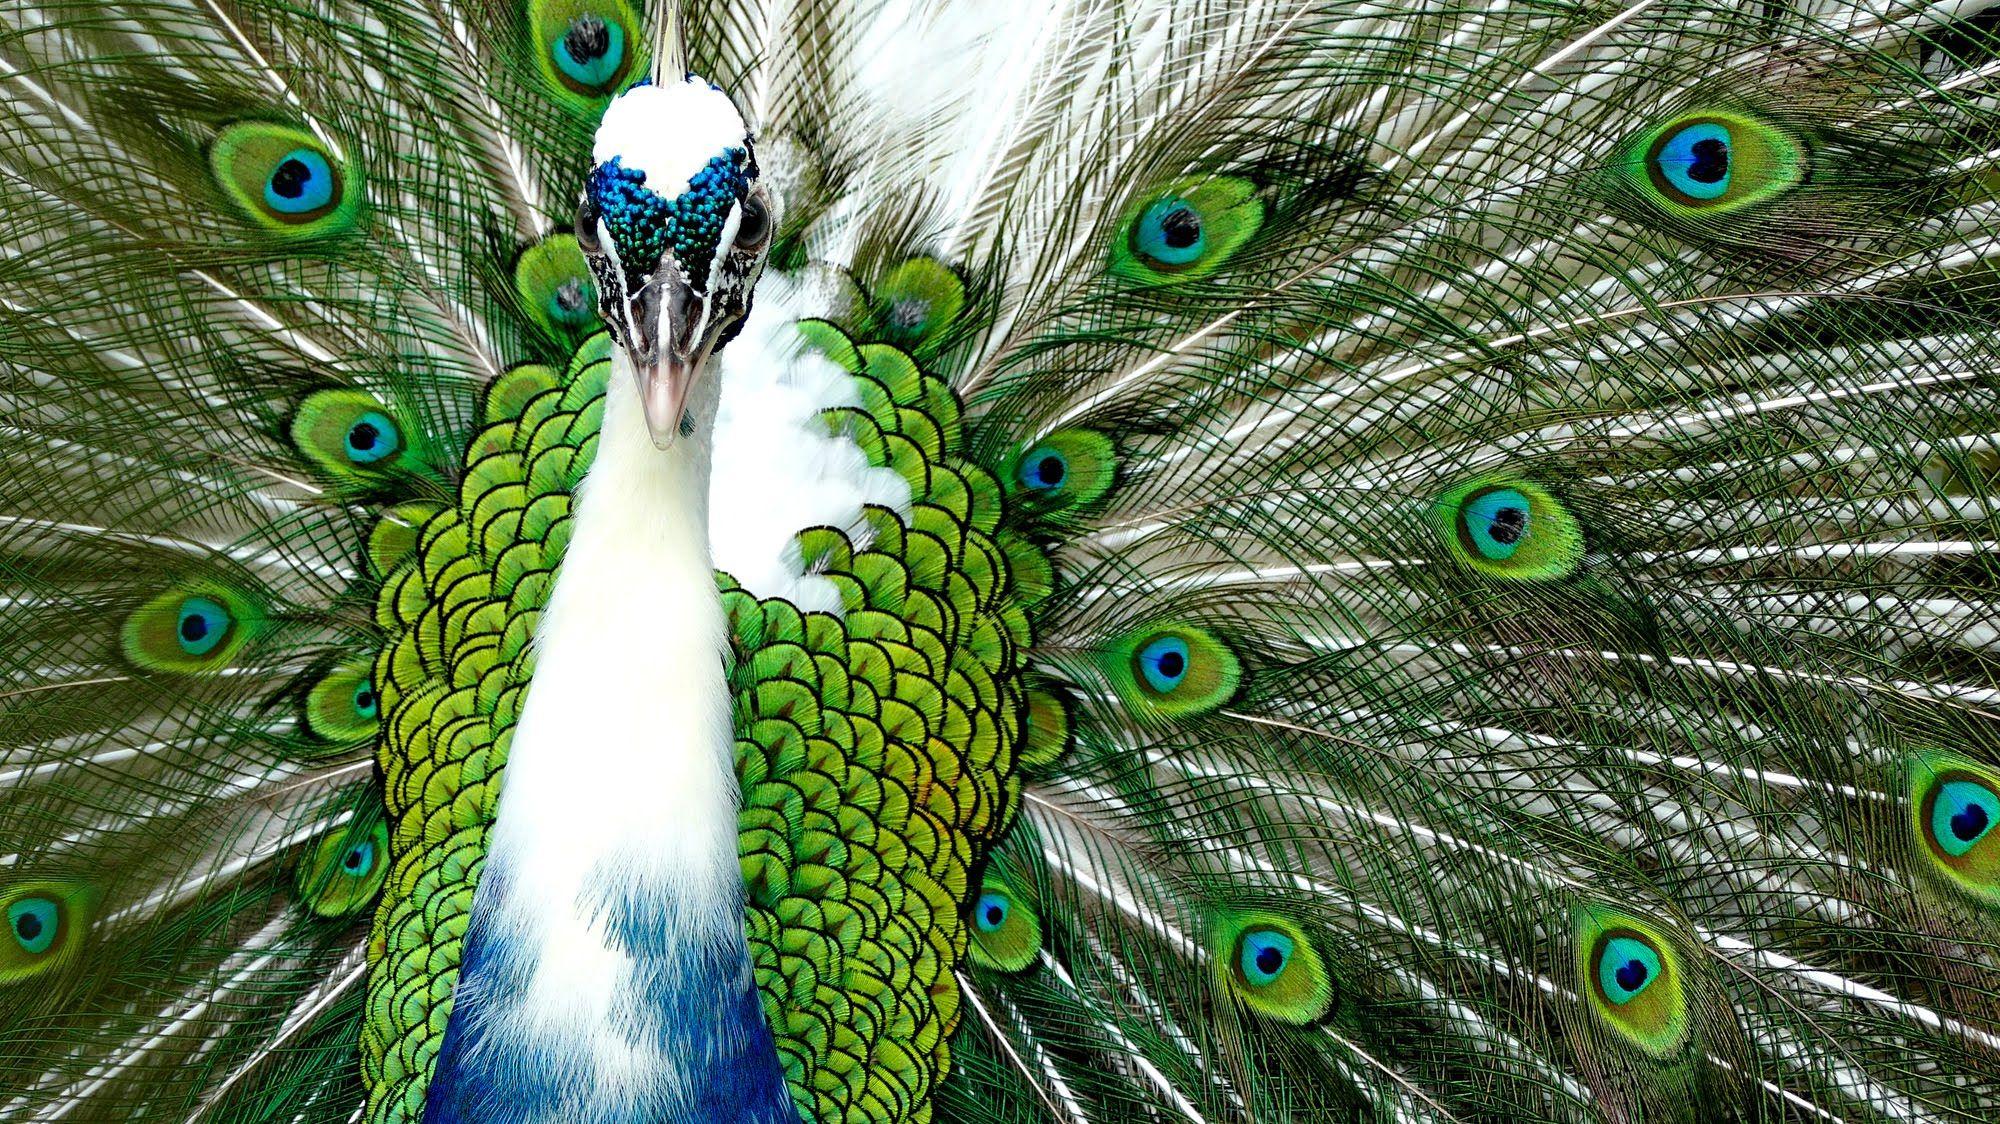 hd peacock